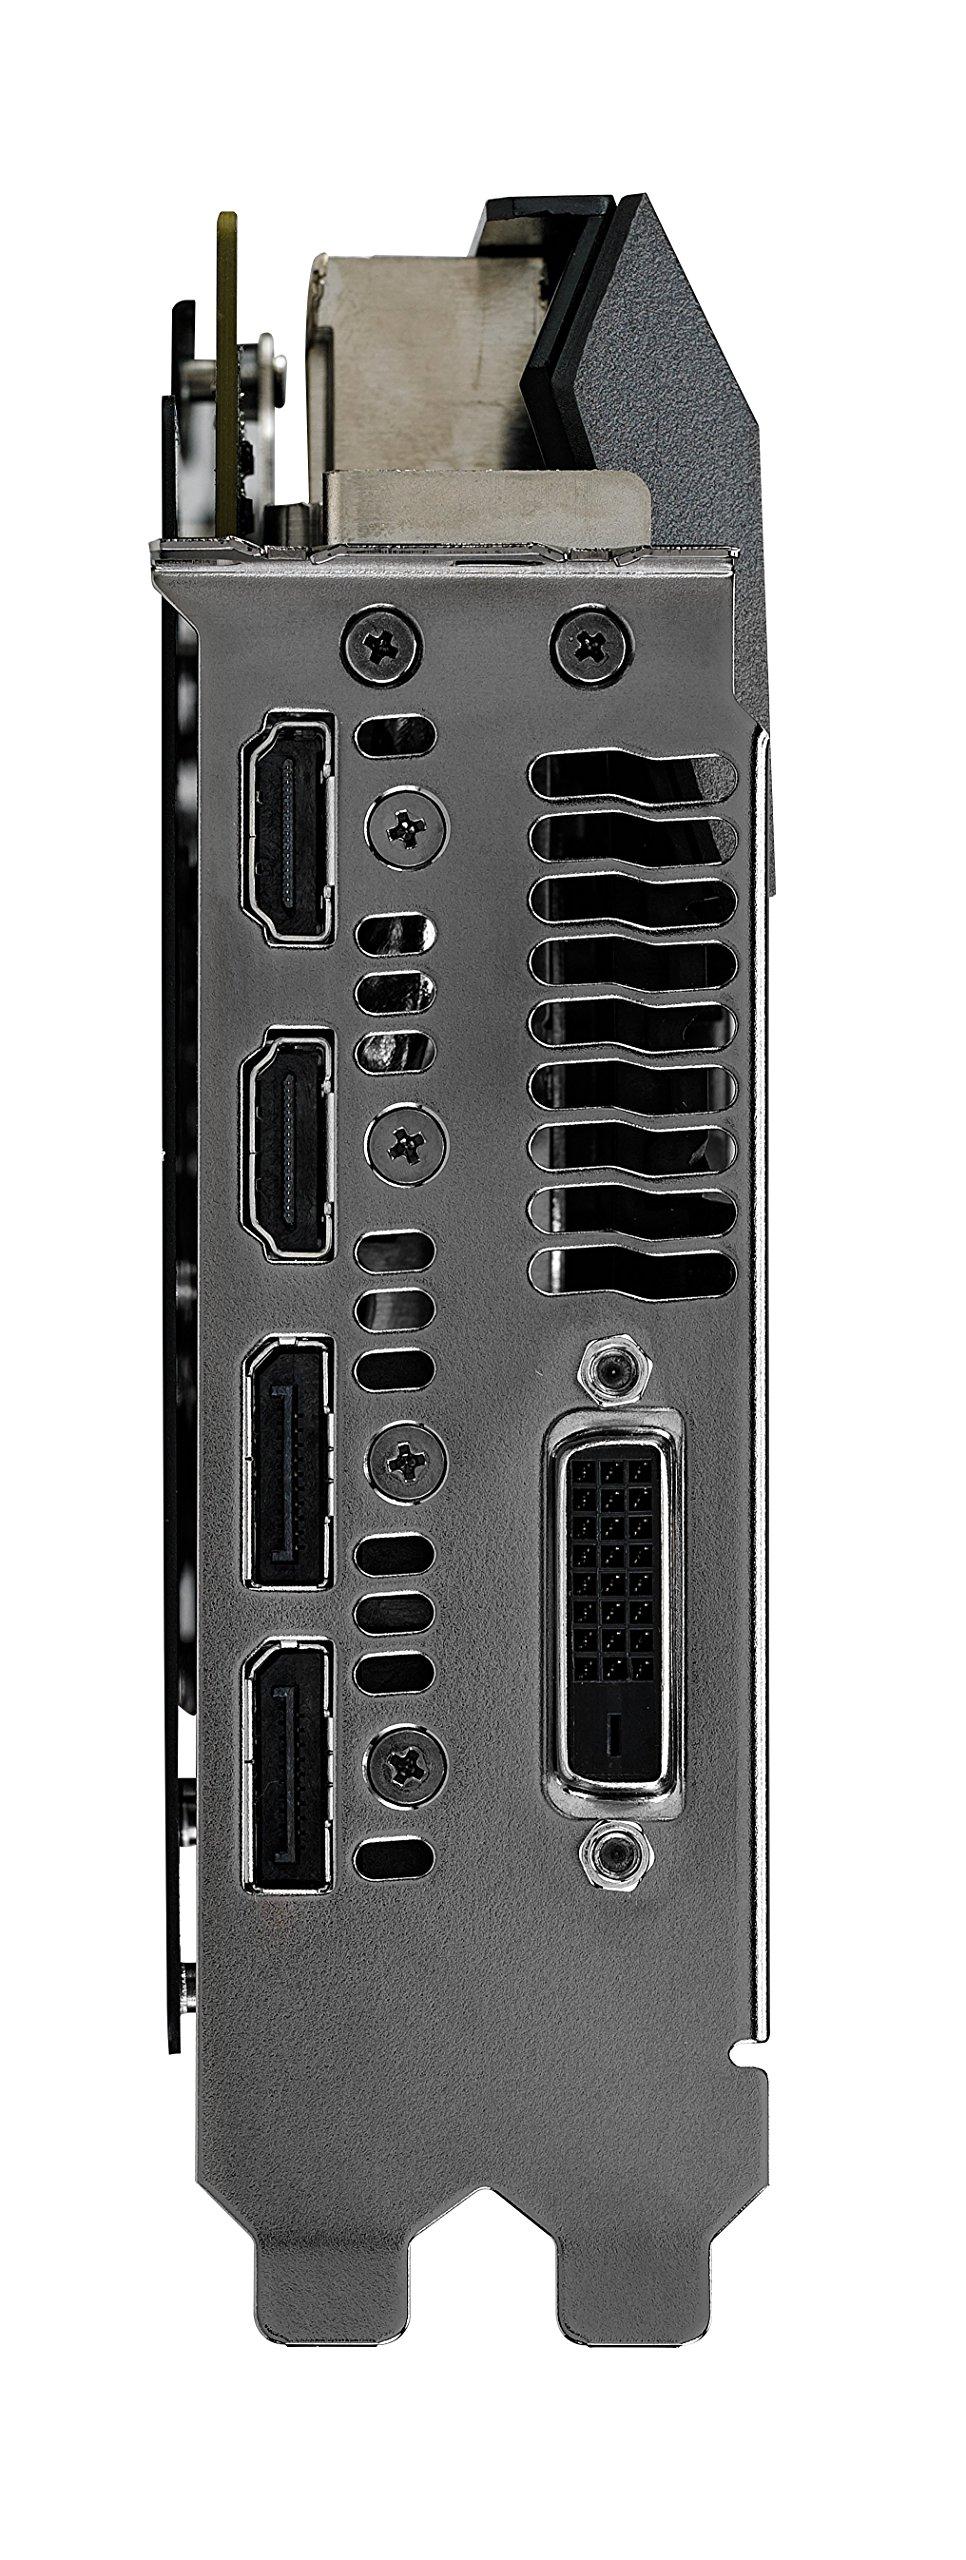 ASUS GeForce GTX 1070 8GB ROG STRIX OC Edition Graphic Card STRIX-GTX1070-O8G-GAMING by Asus (Image #5)